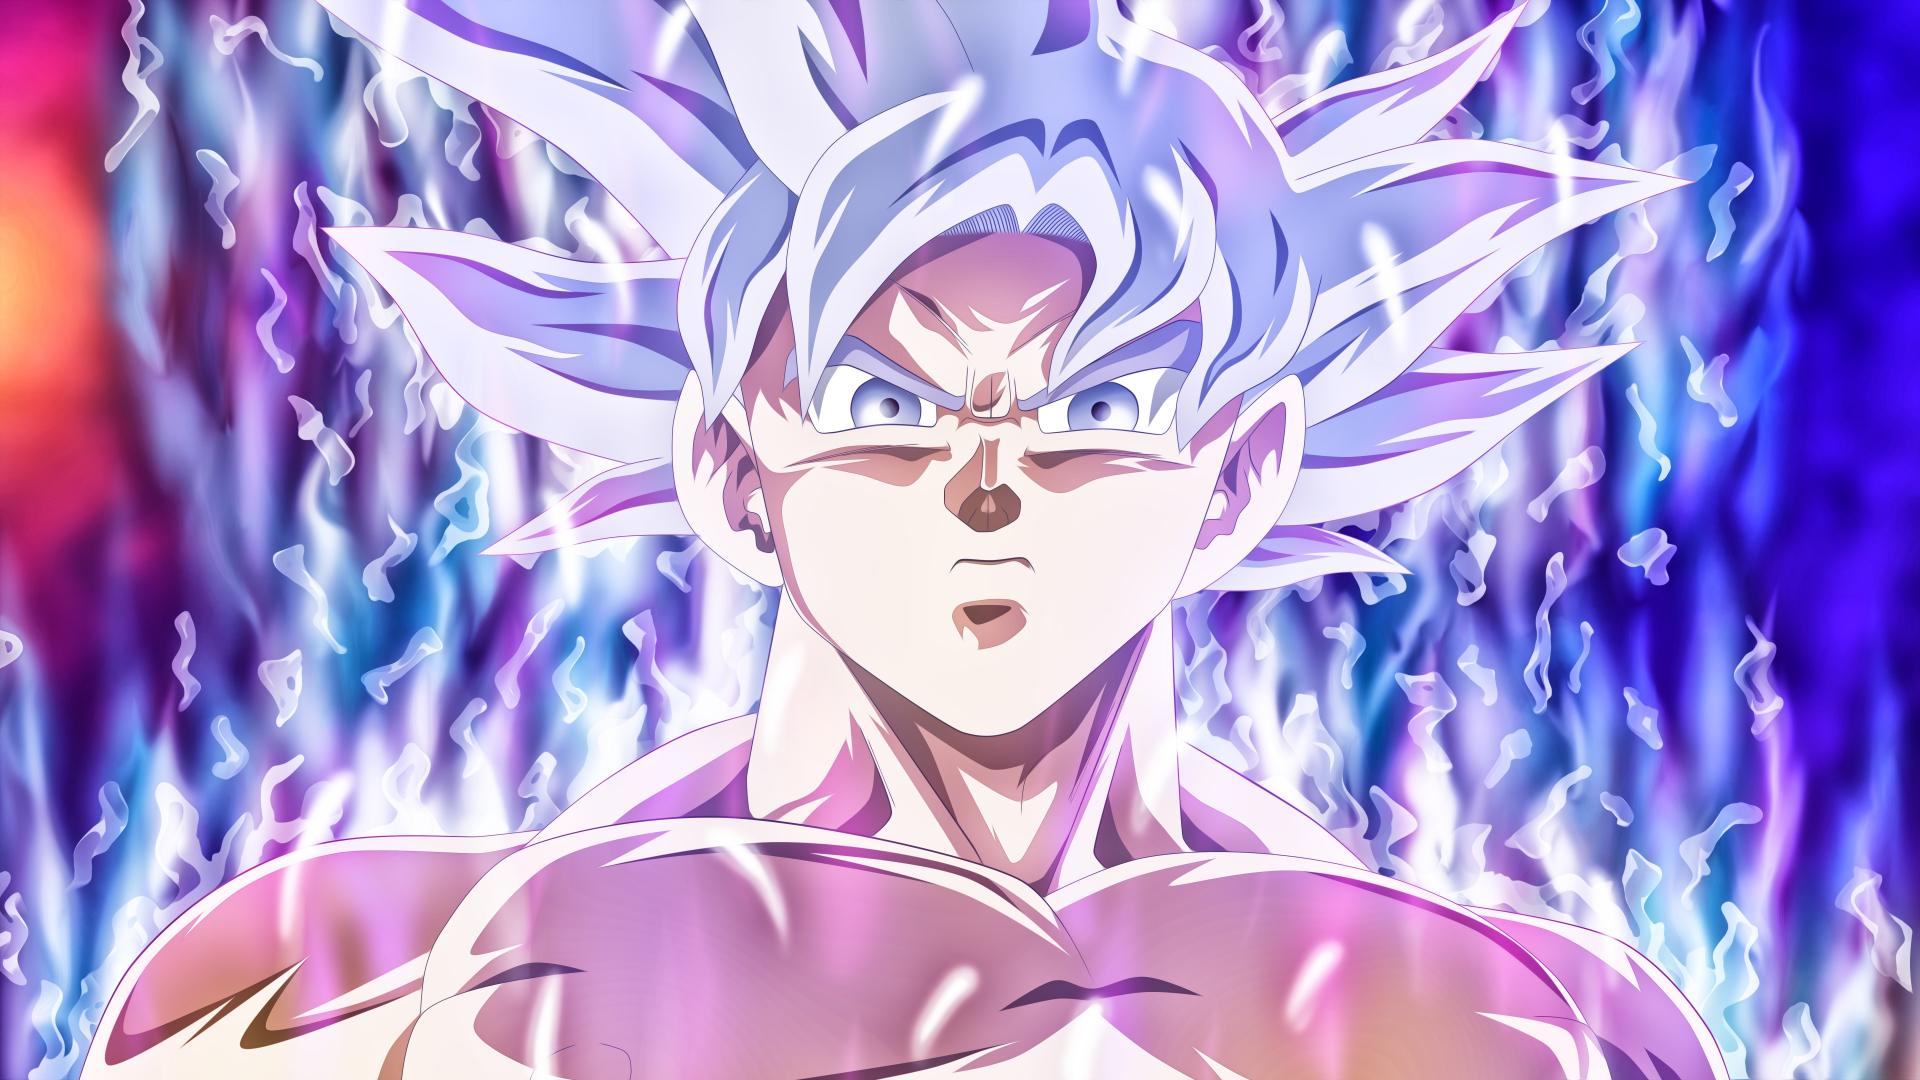 Download 1920x1080 Wallpaper Ultra Instinct Dragon Ball Son Goku